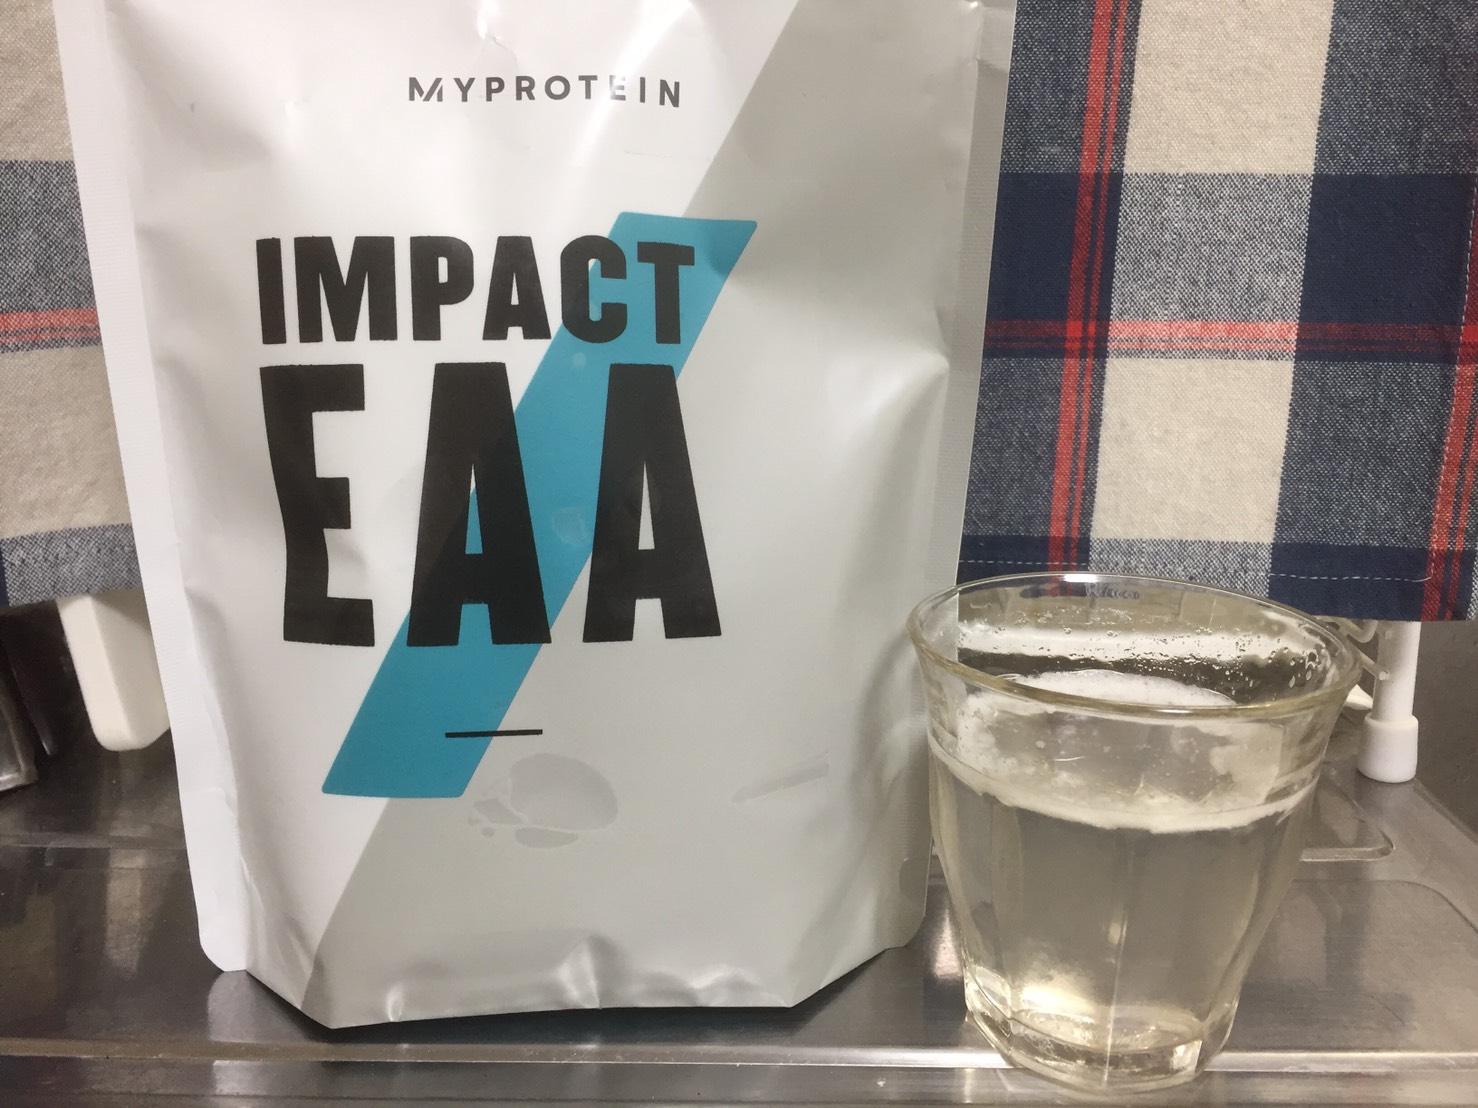 Impact EAAノンフレーバーの評価